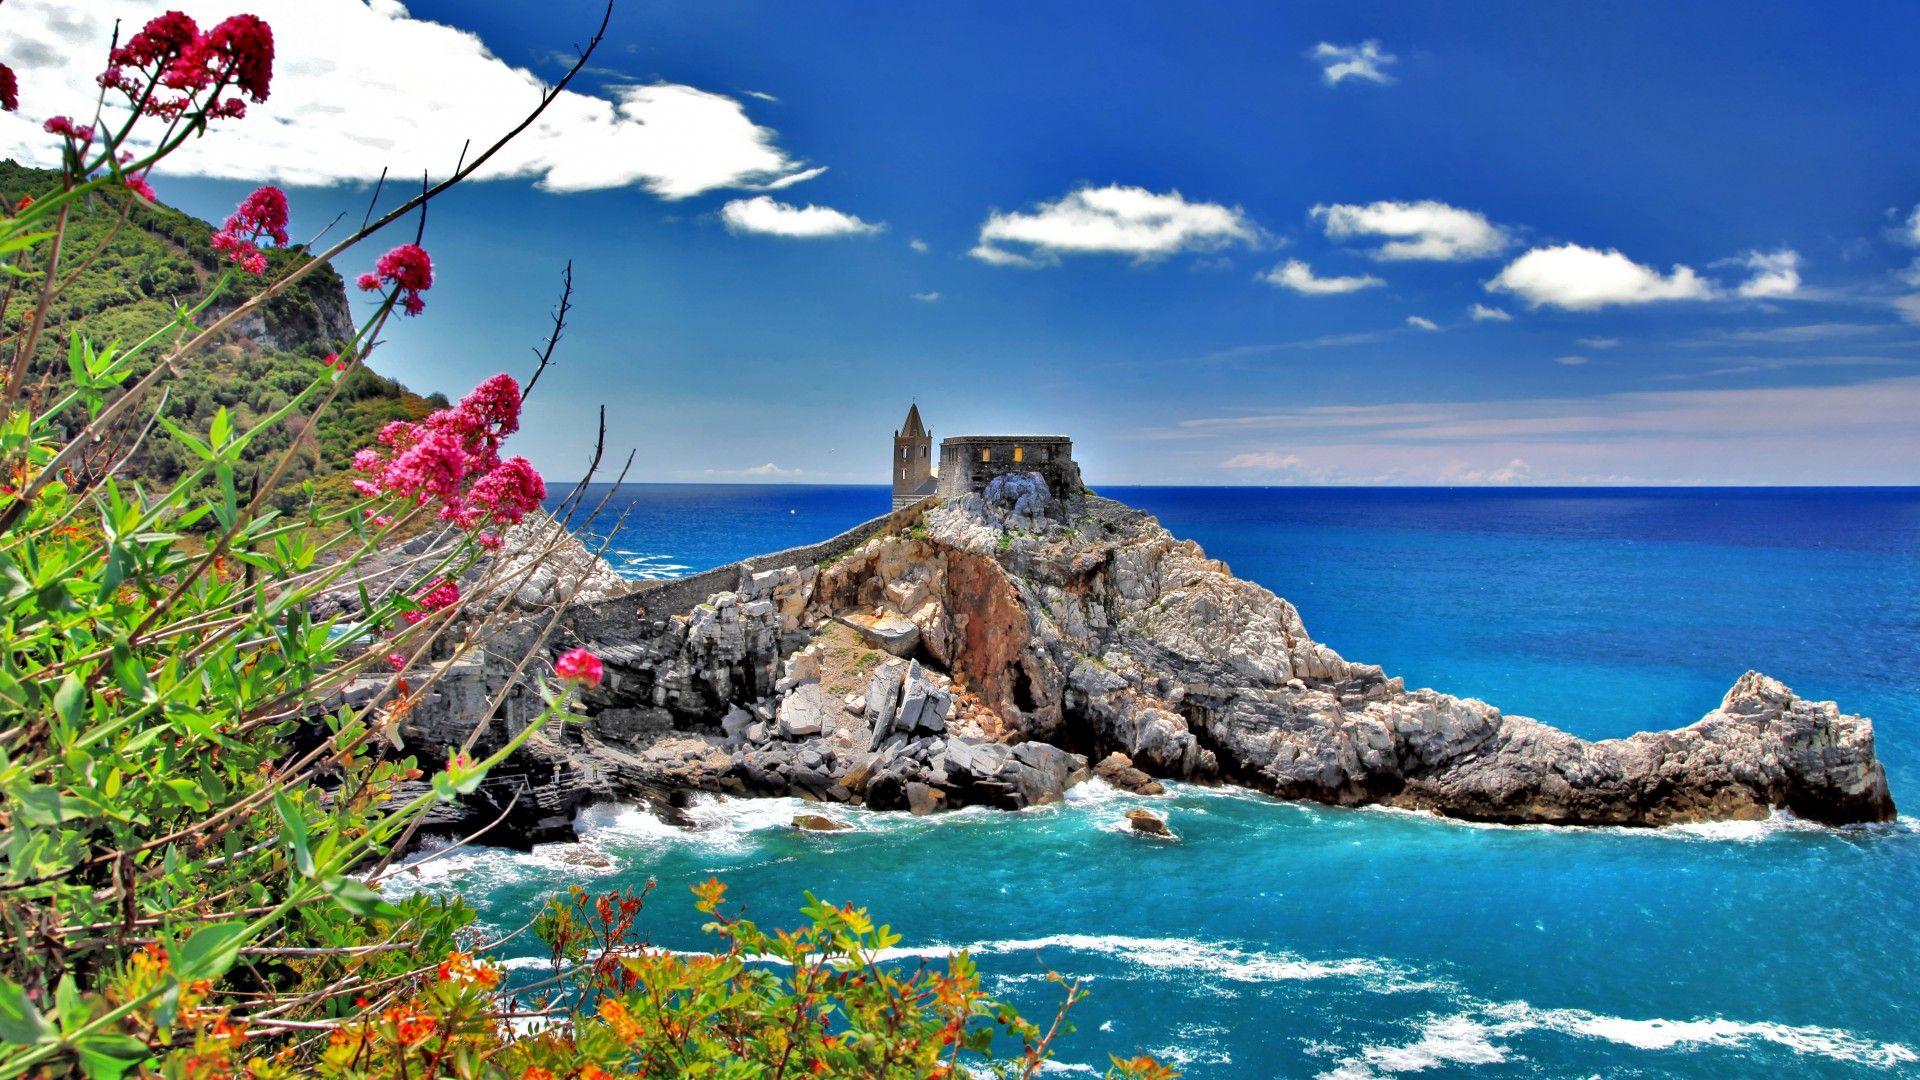 Italy Sea Photos Landscapes